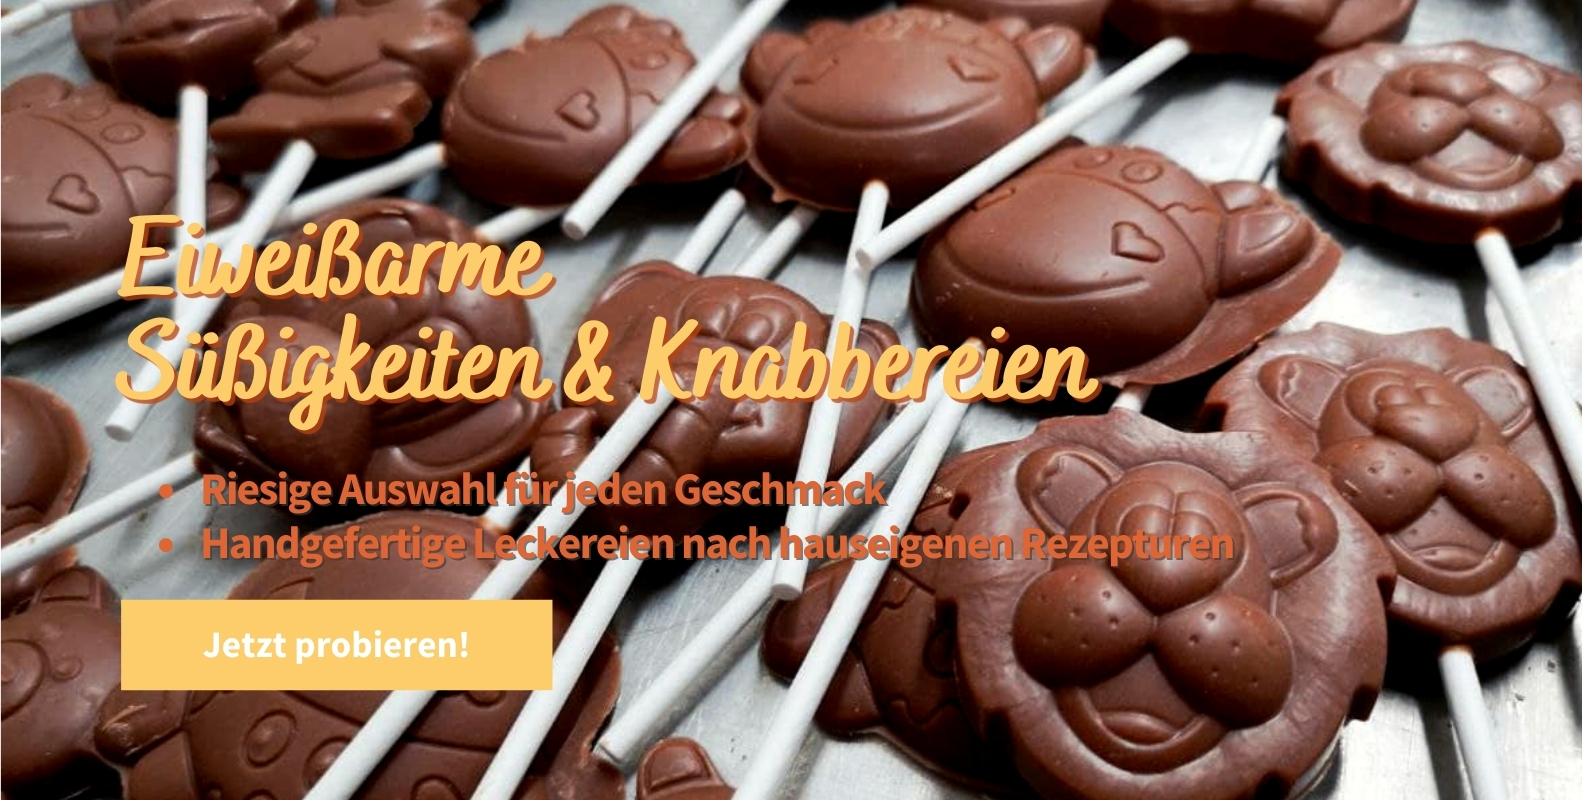 Eiweißarme Süßigkeiten & Knabbereien kaufen - Eiweißarme Lebensmittel kaufen